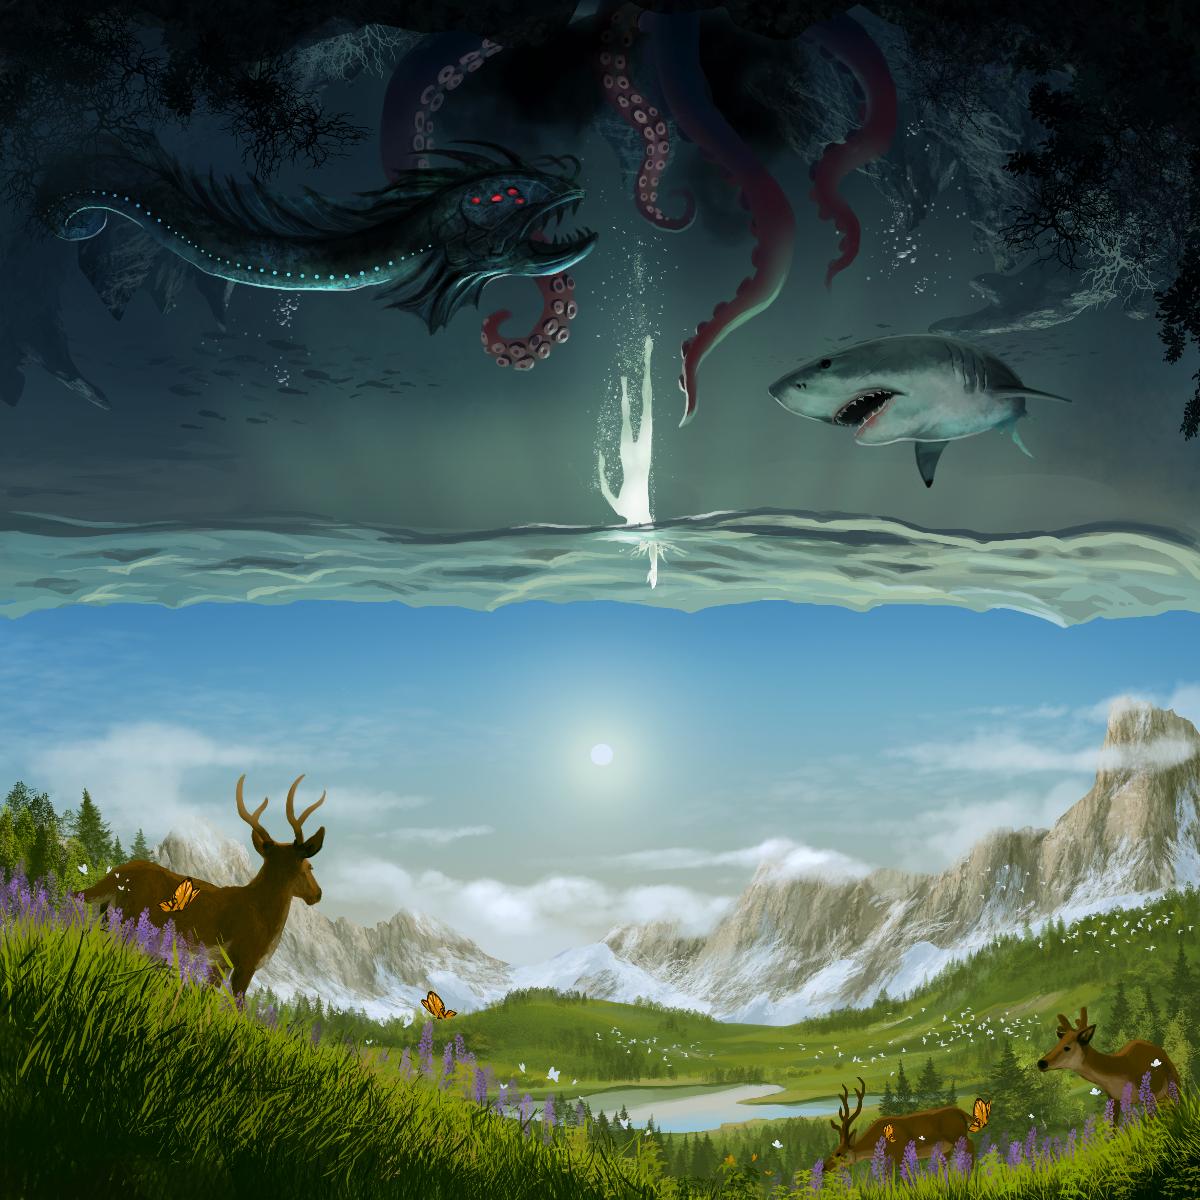 Surreal Landscape Painting